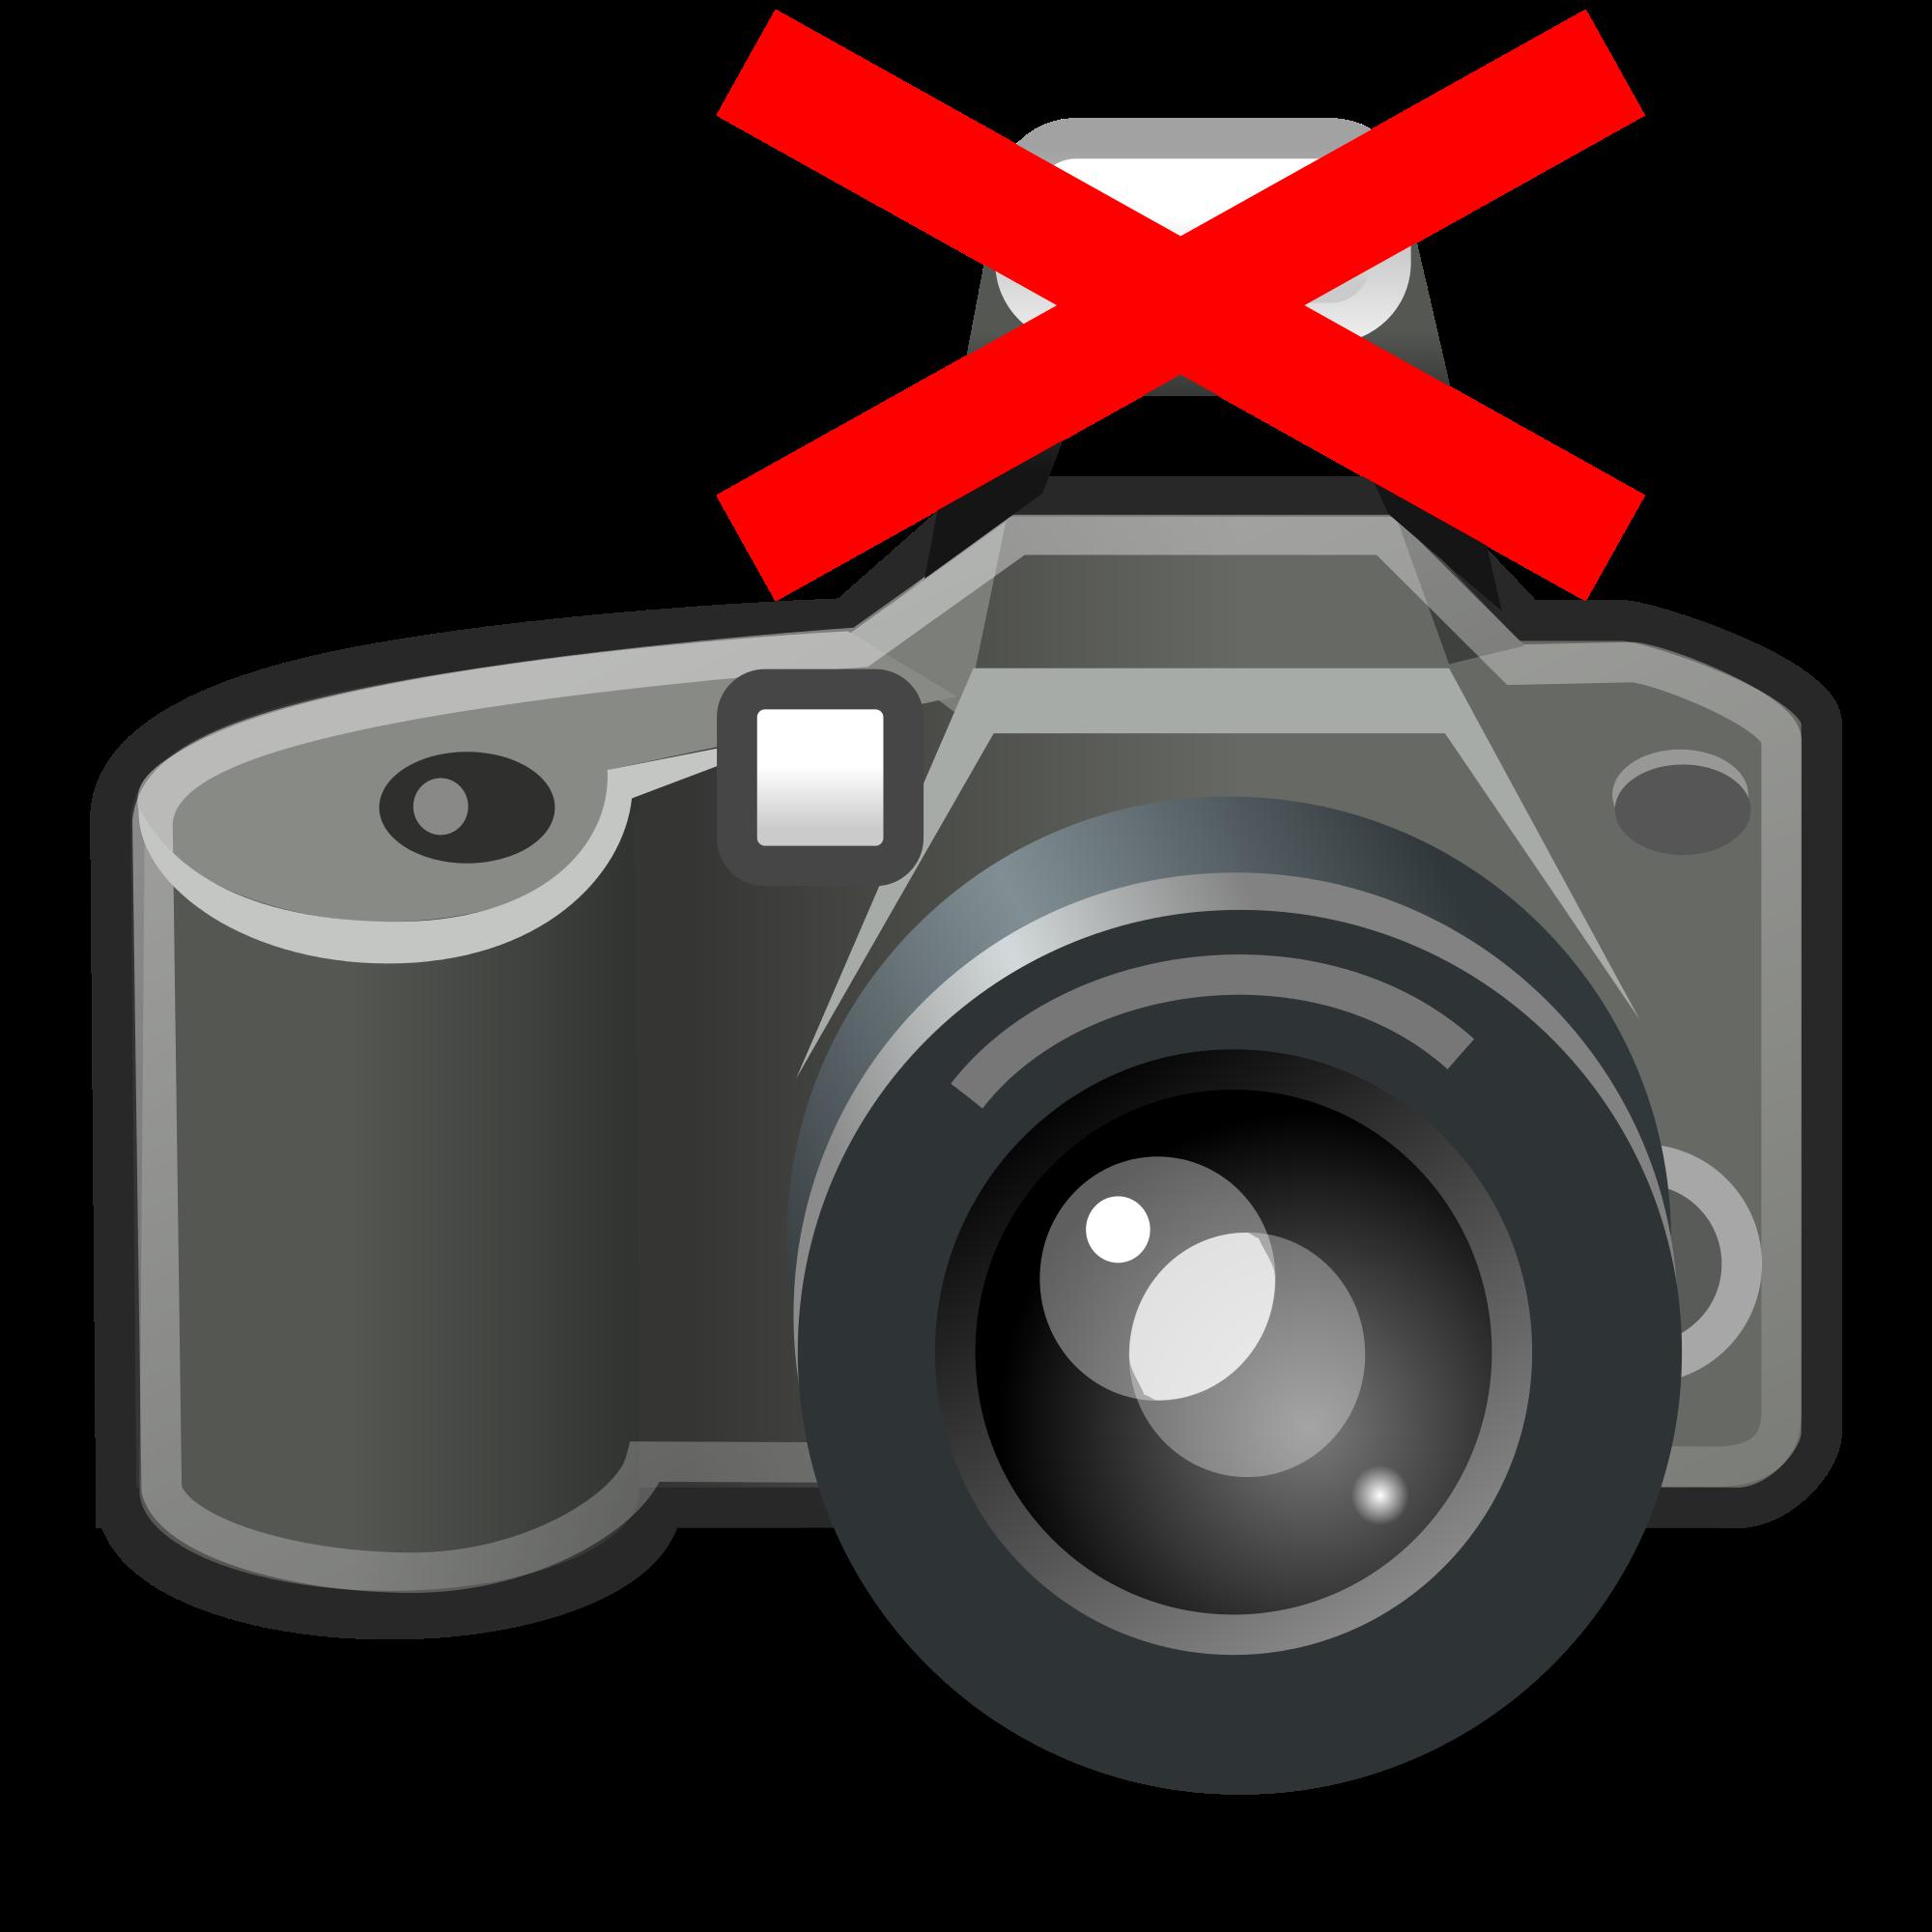 Flash clipart camera photo shoot. File no svg wikimedia